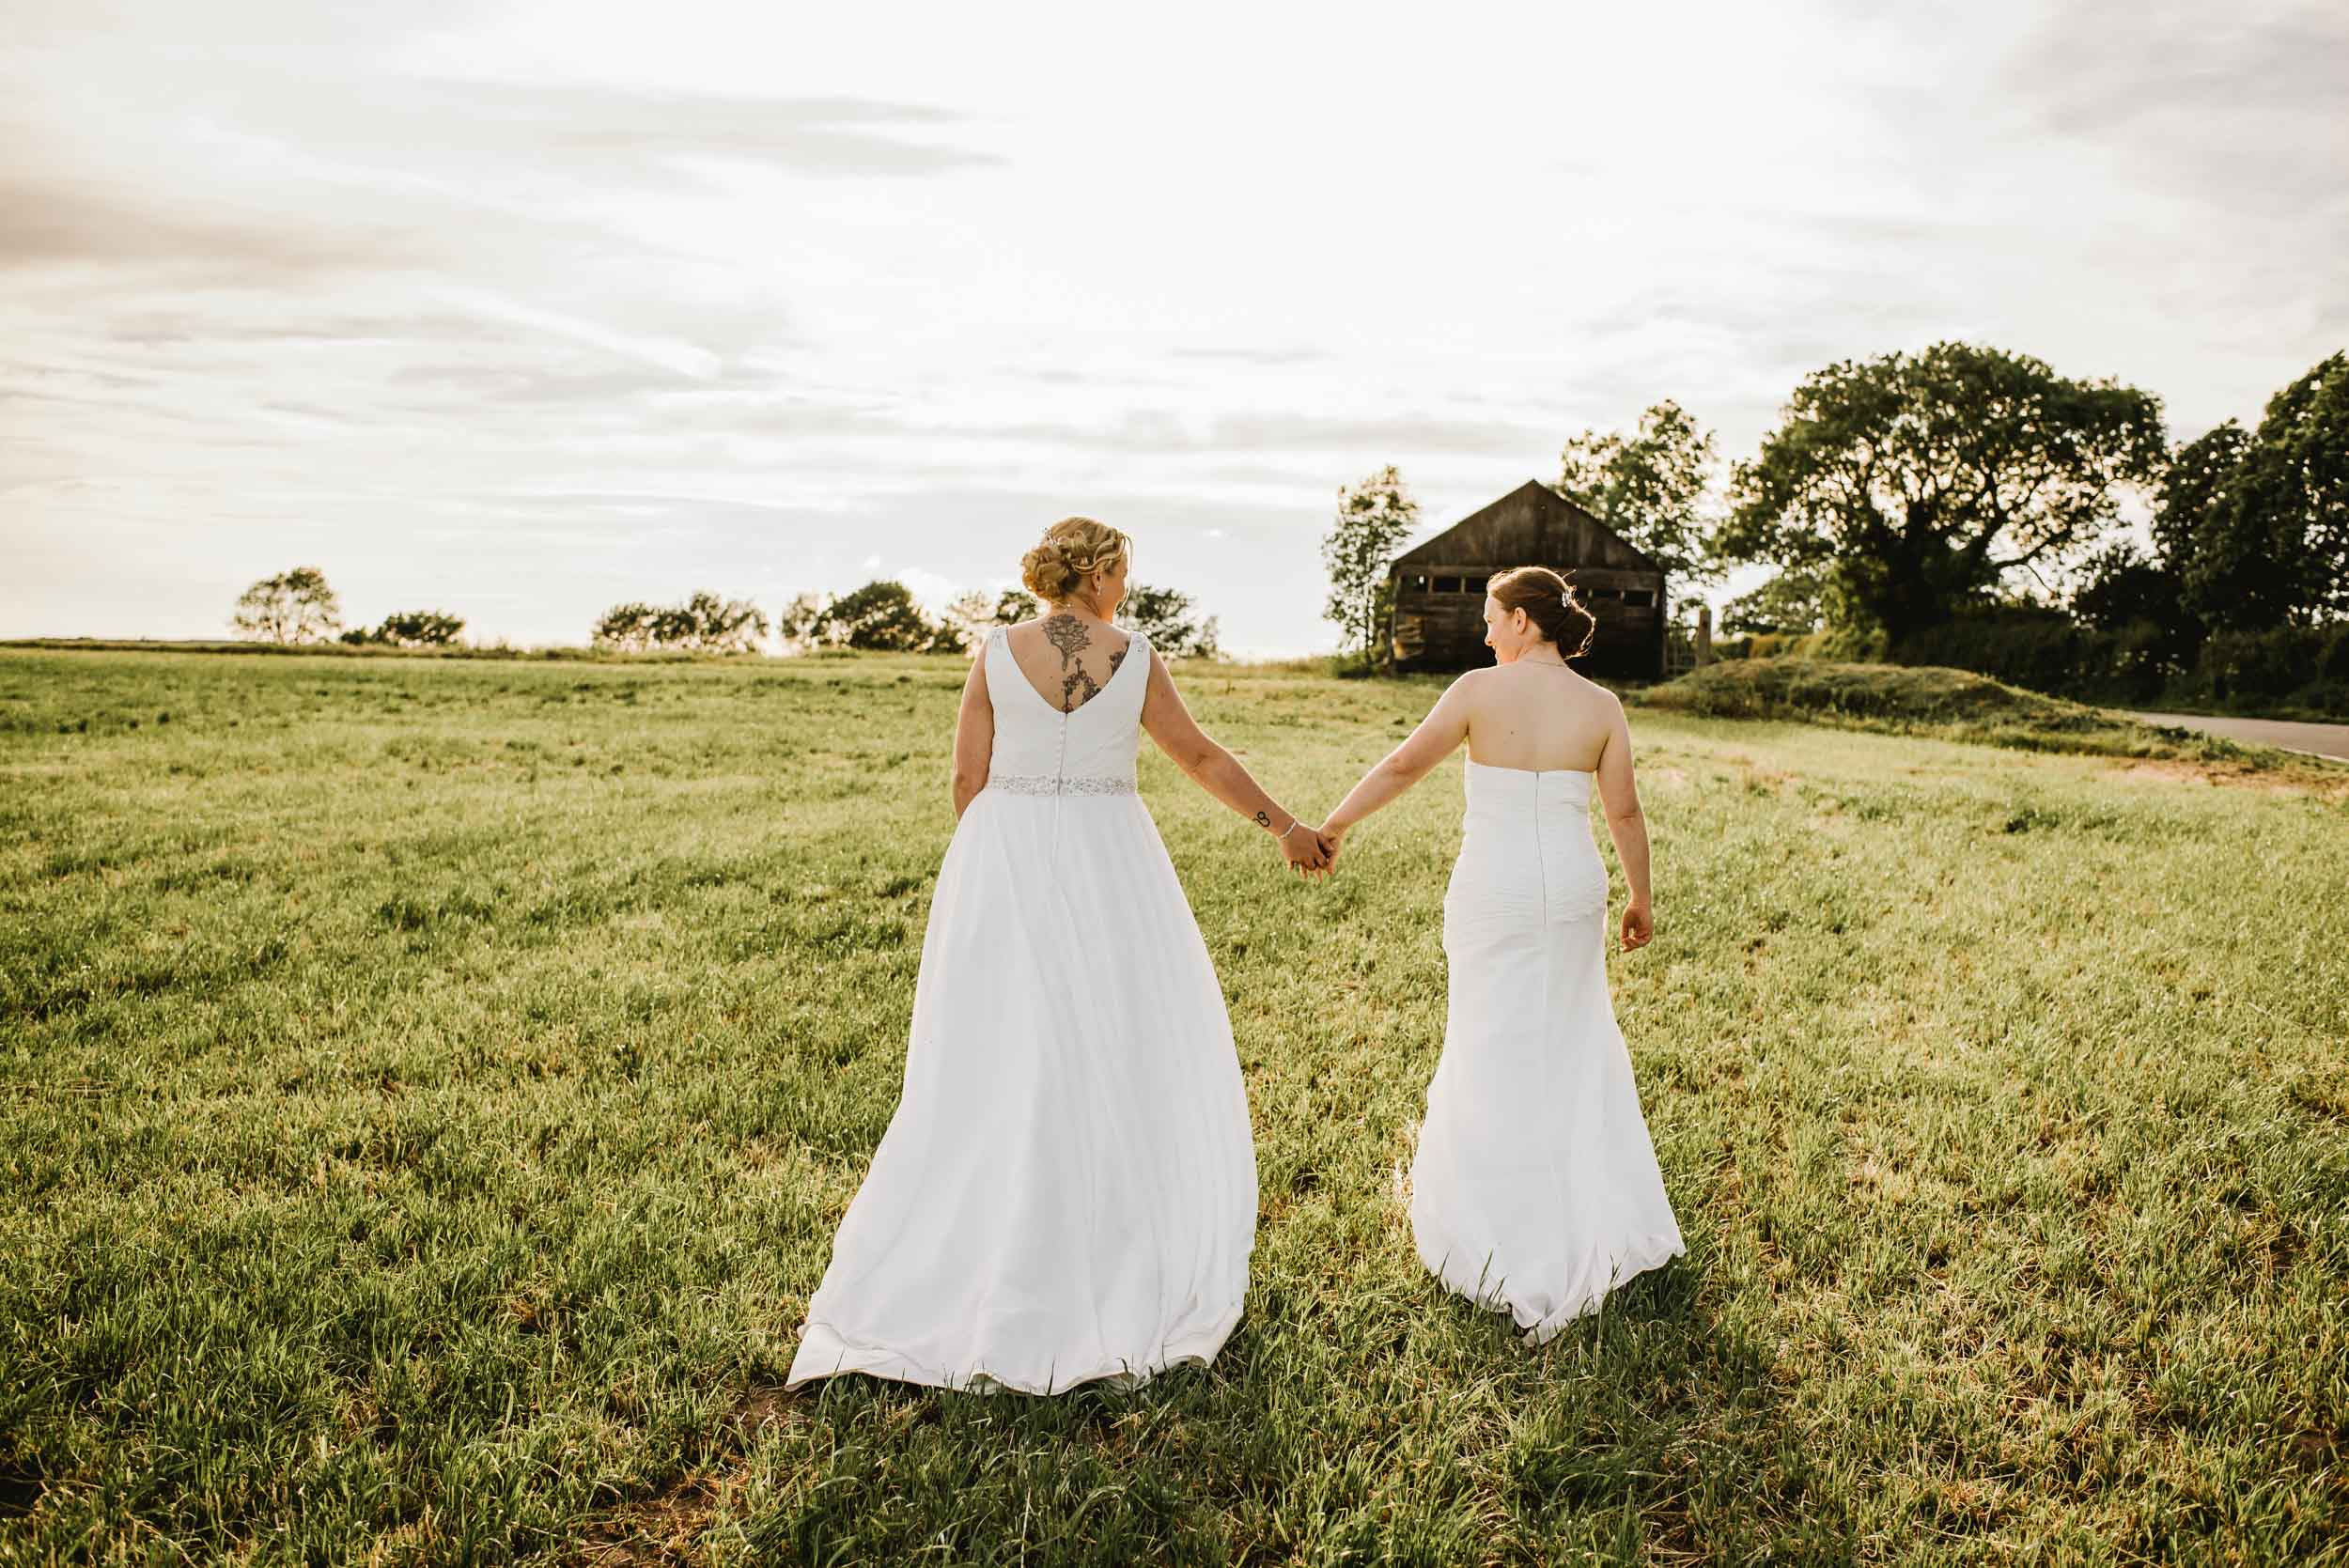 Donington-park-farm-wedding-photography-624.jpg